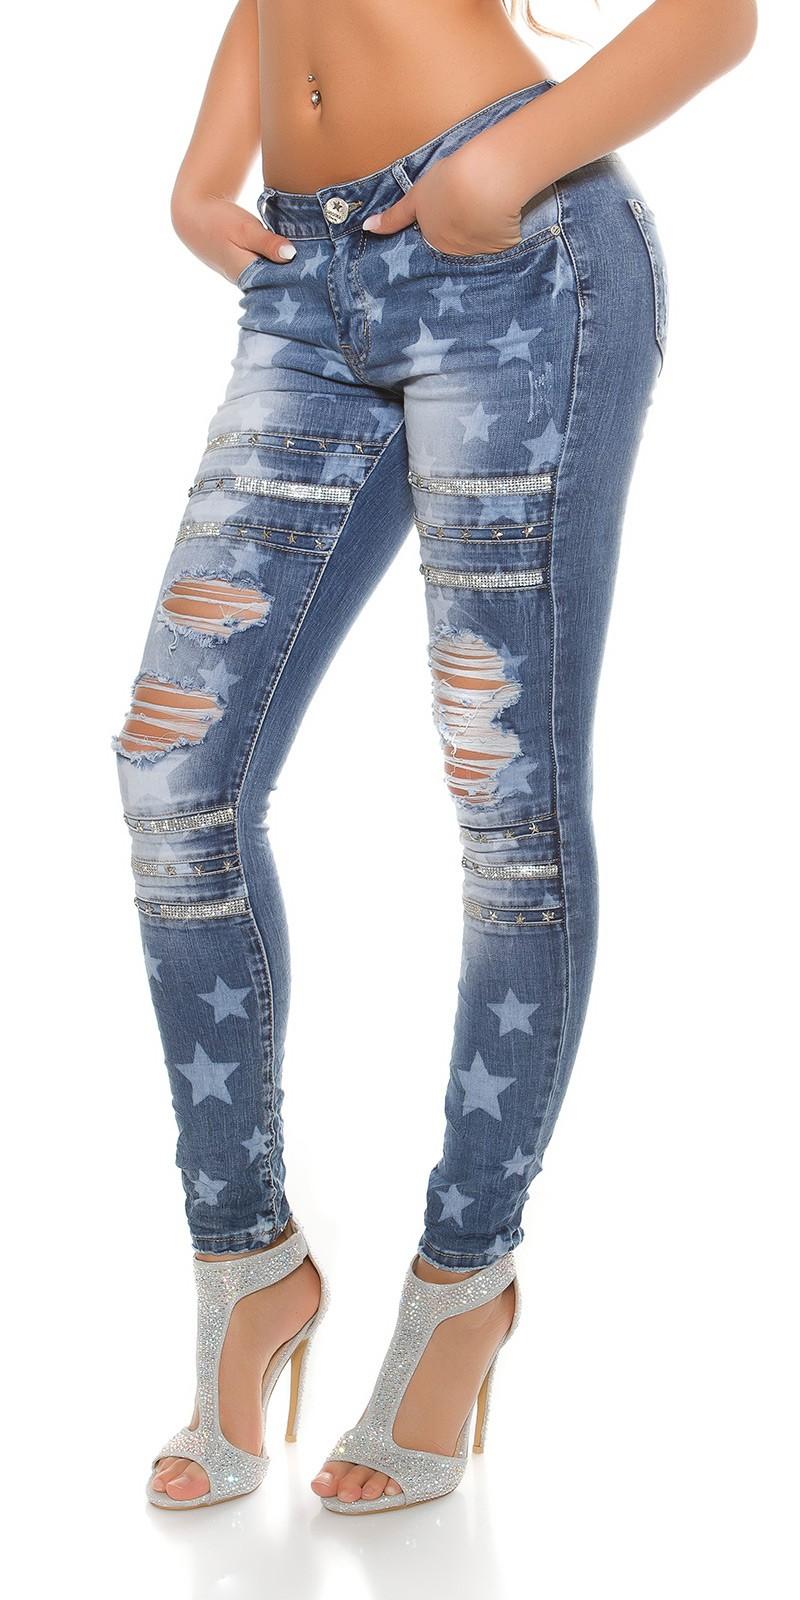 trendstylez vintage jeans mit bleach sternen. Black Bedroom Furniture Sets. Home Design Ideas